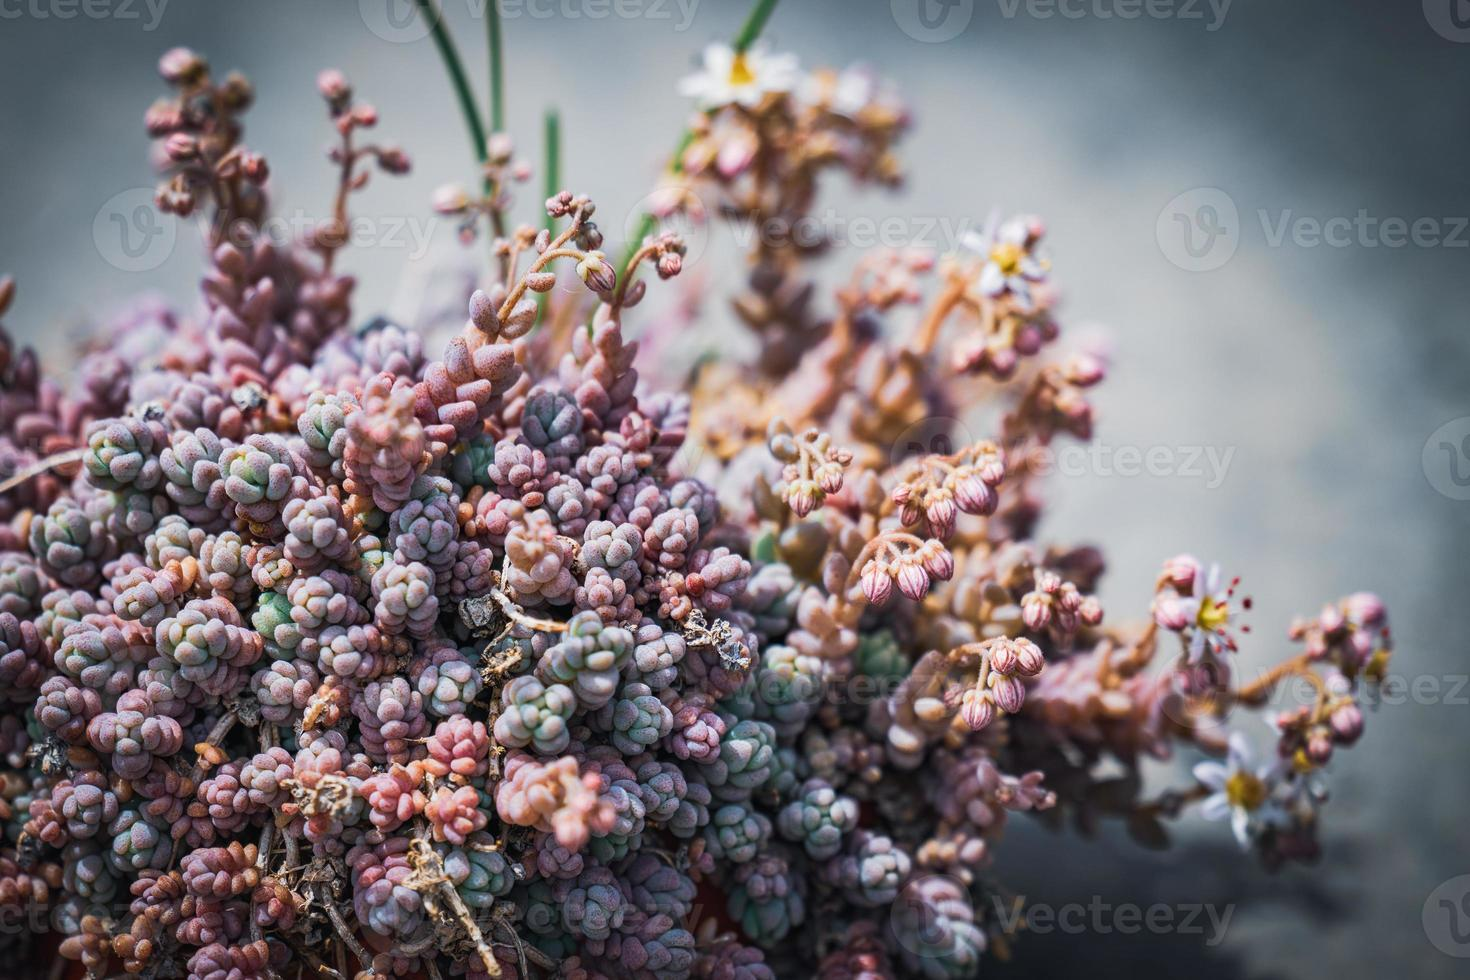 pequena planta com flor de corsa stonecrop foto